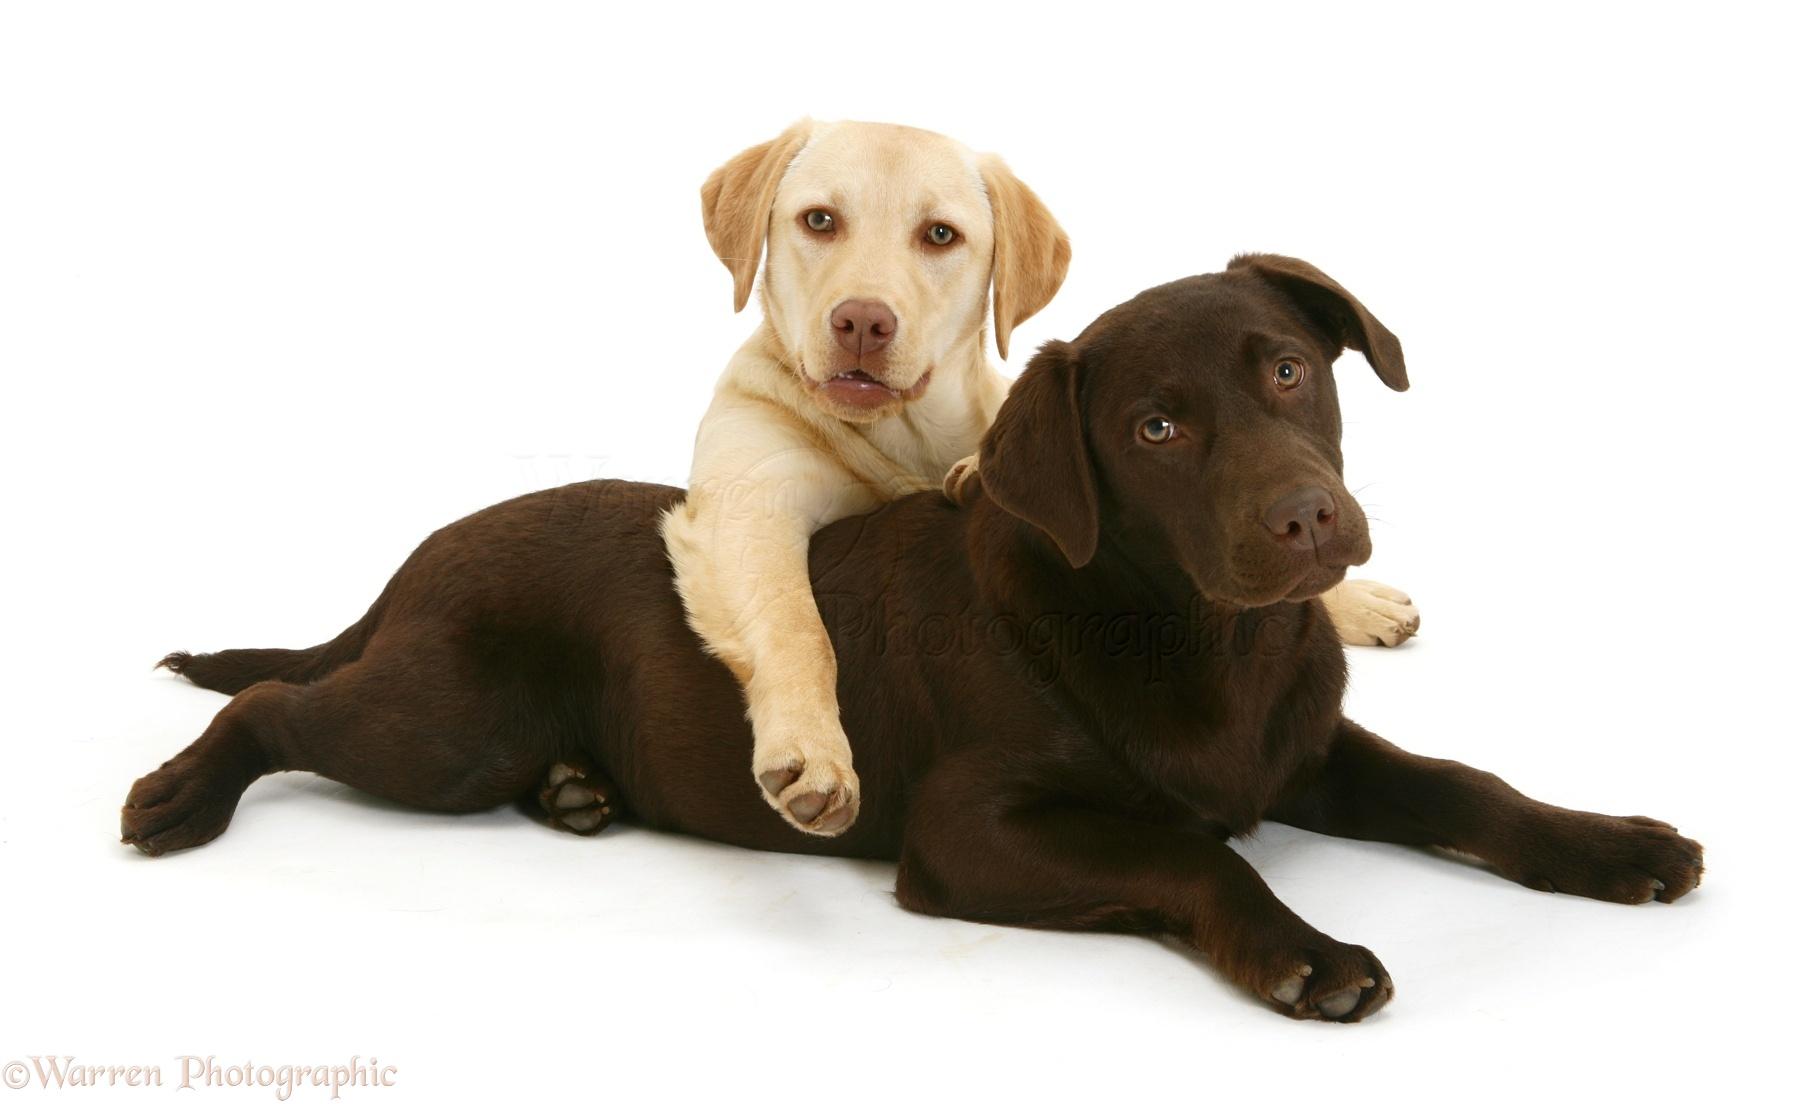 Dogs: Yellow and chocolate Labrador Retrievers photo - WP15063